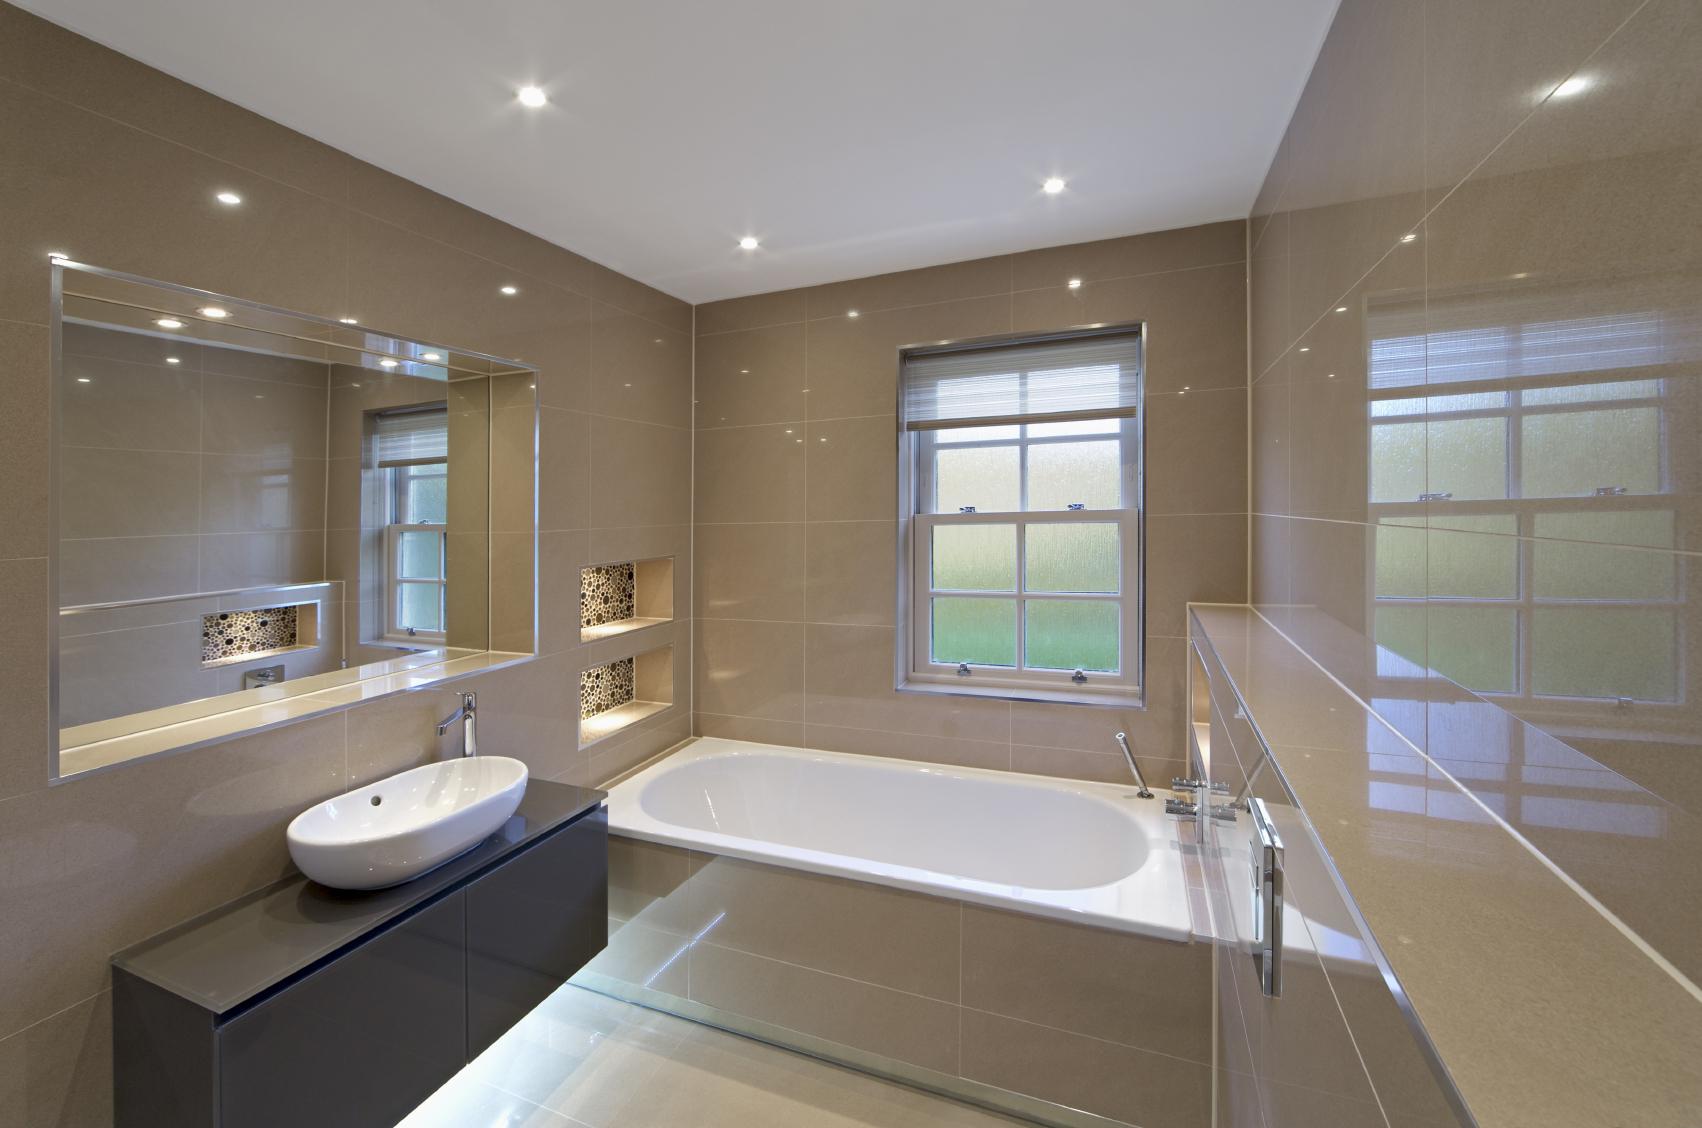 Cozy Image of: bathroom mirror with led lights led bathroom lights